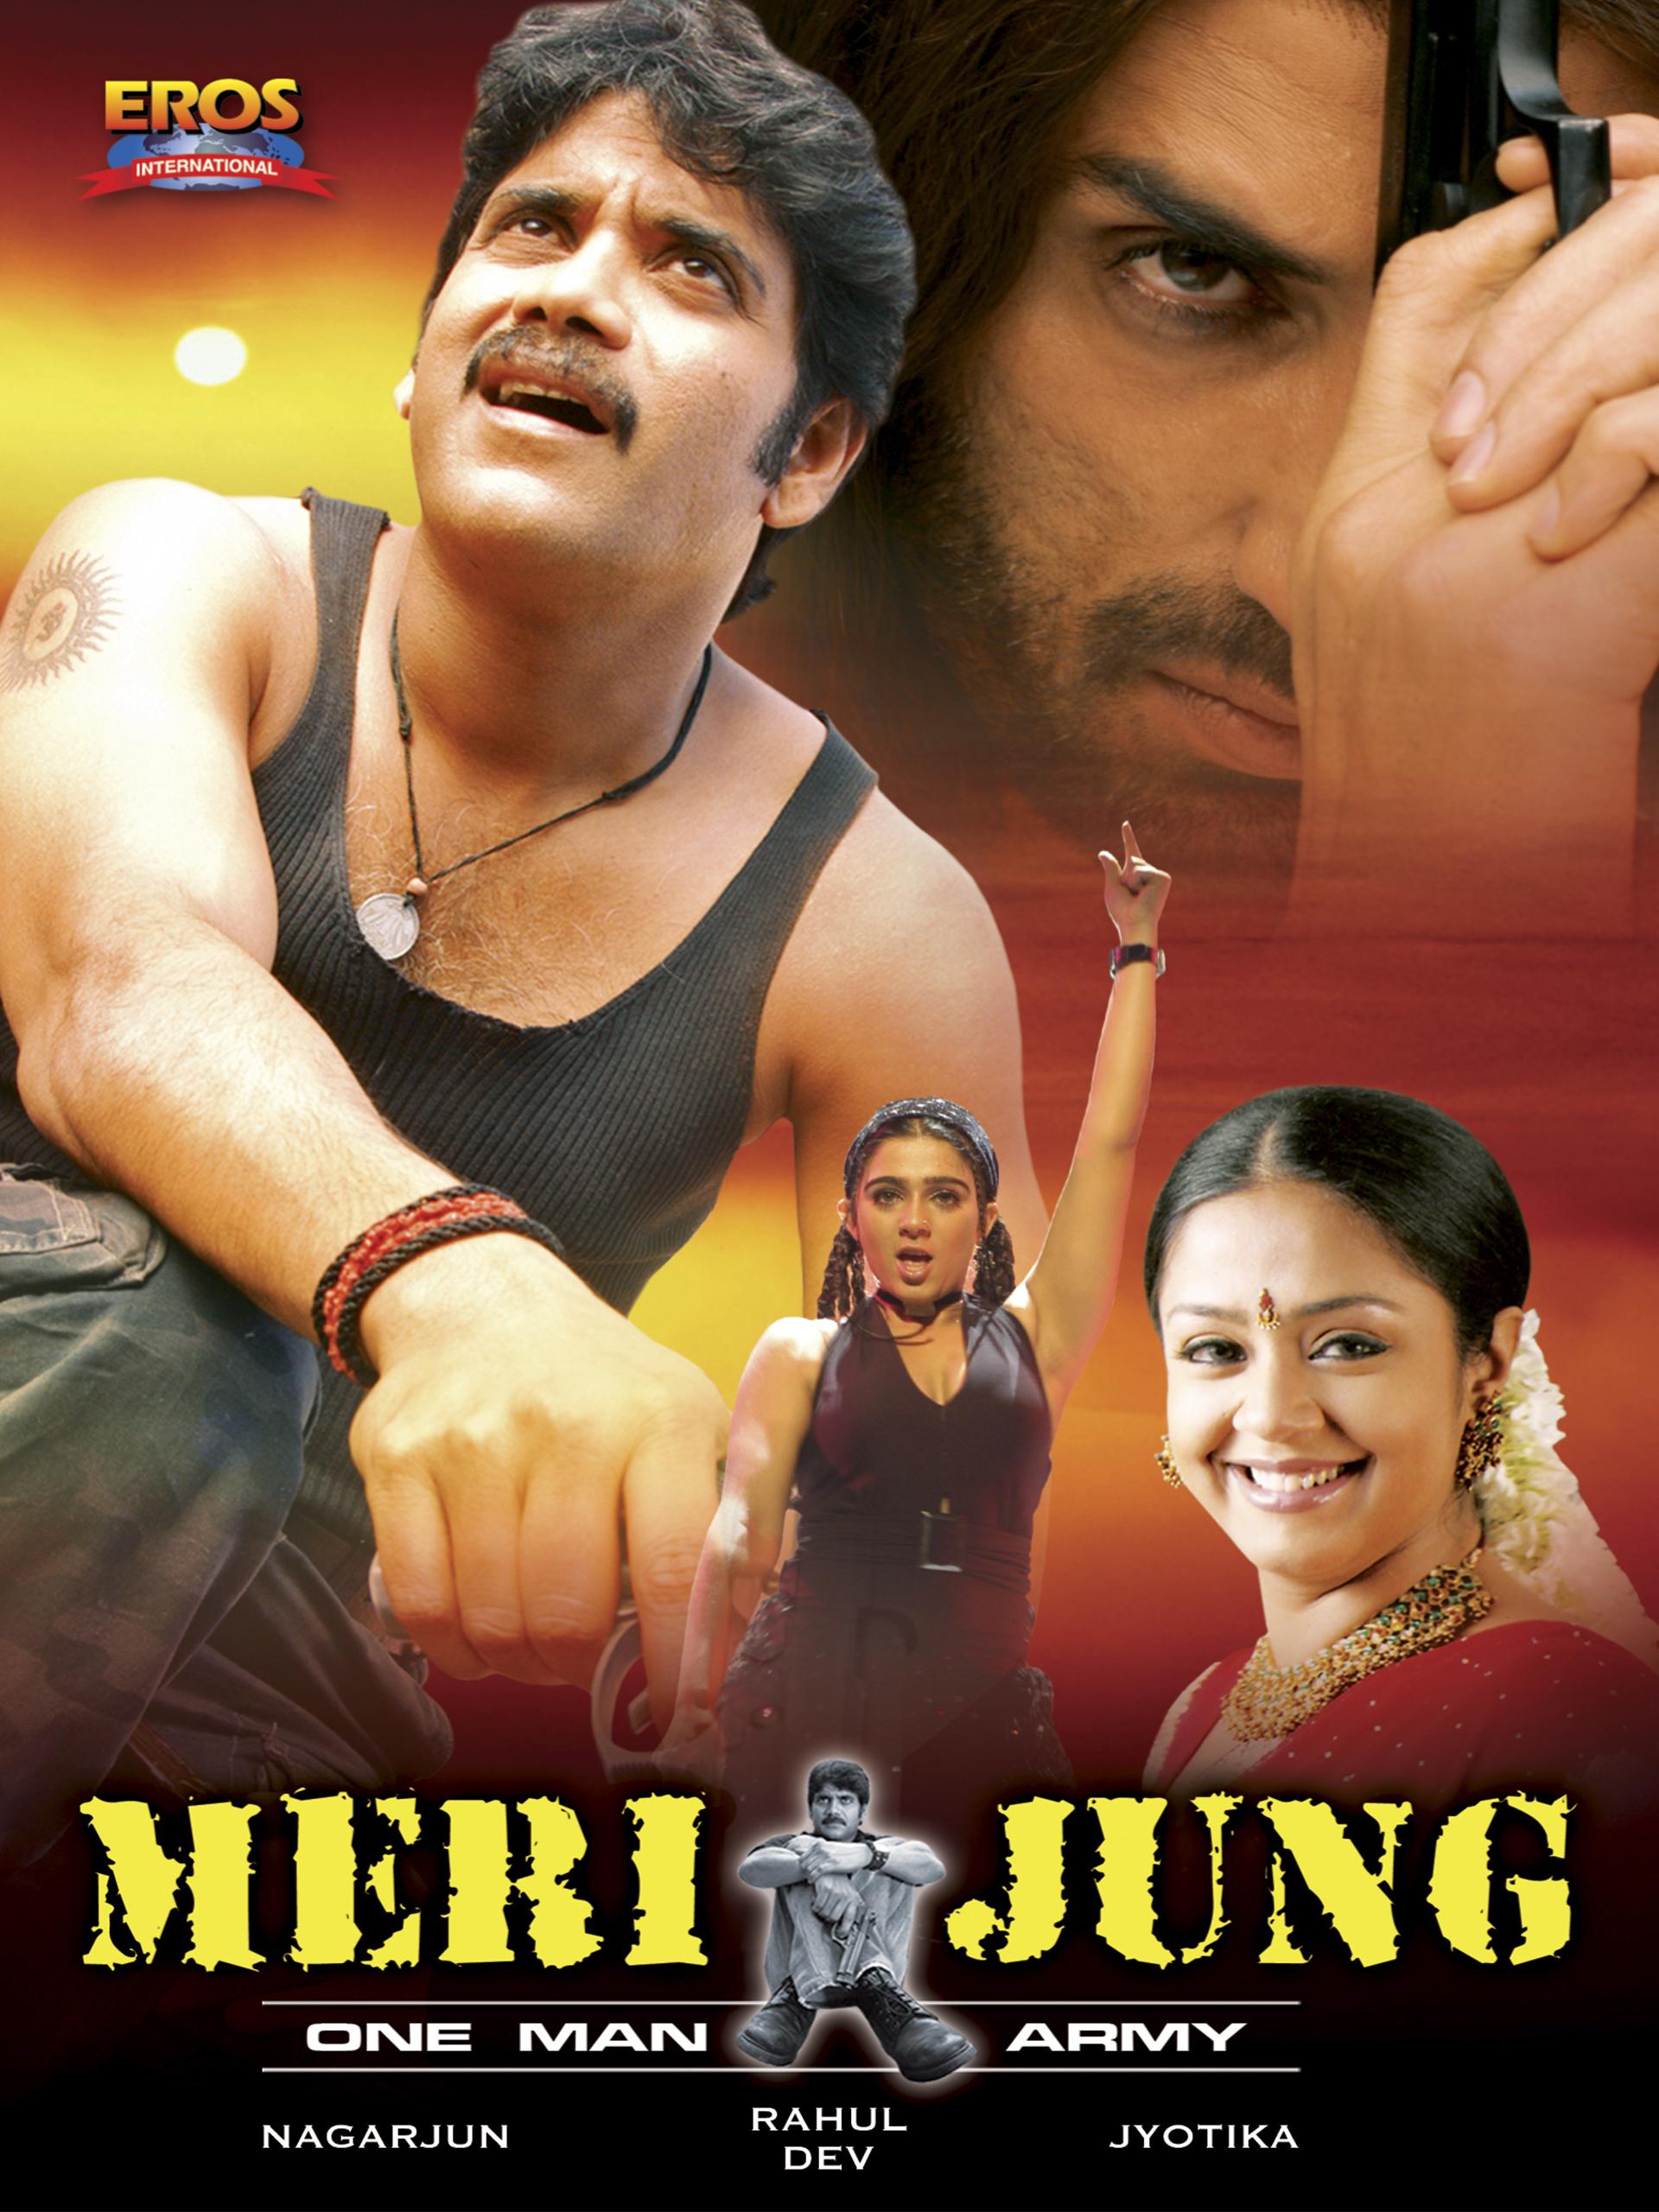 Watch Meri Jung - One Man Army full movie Online - Eros Now